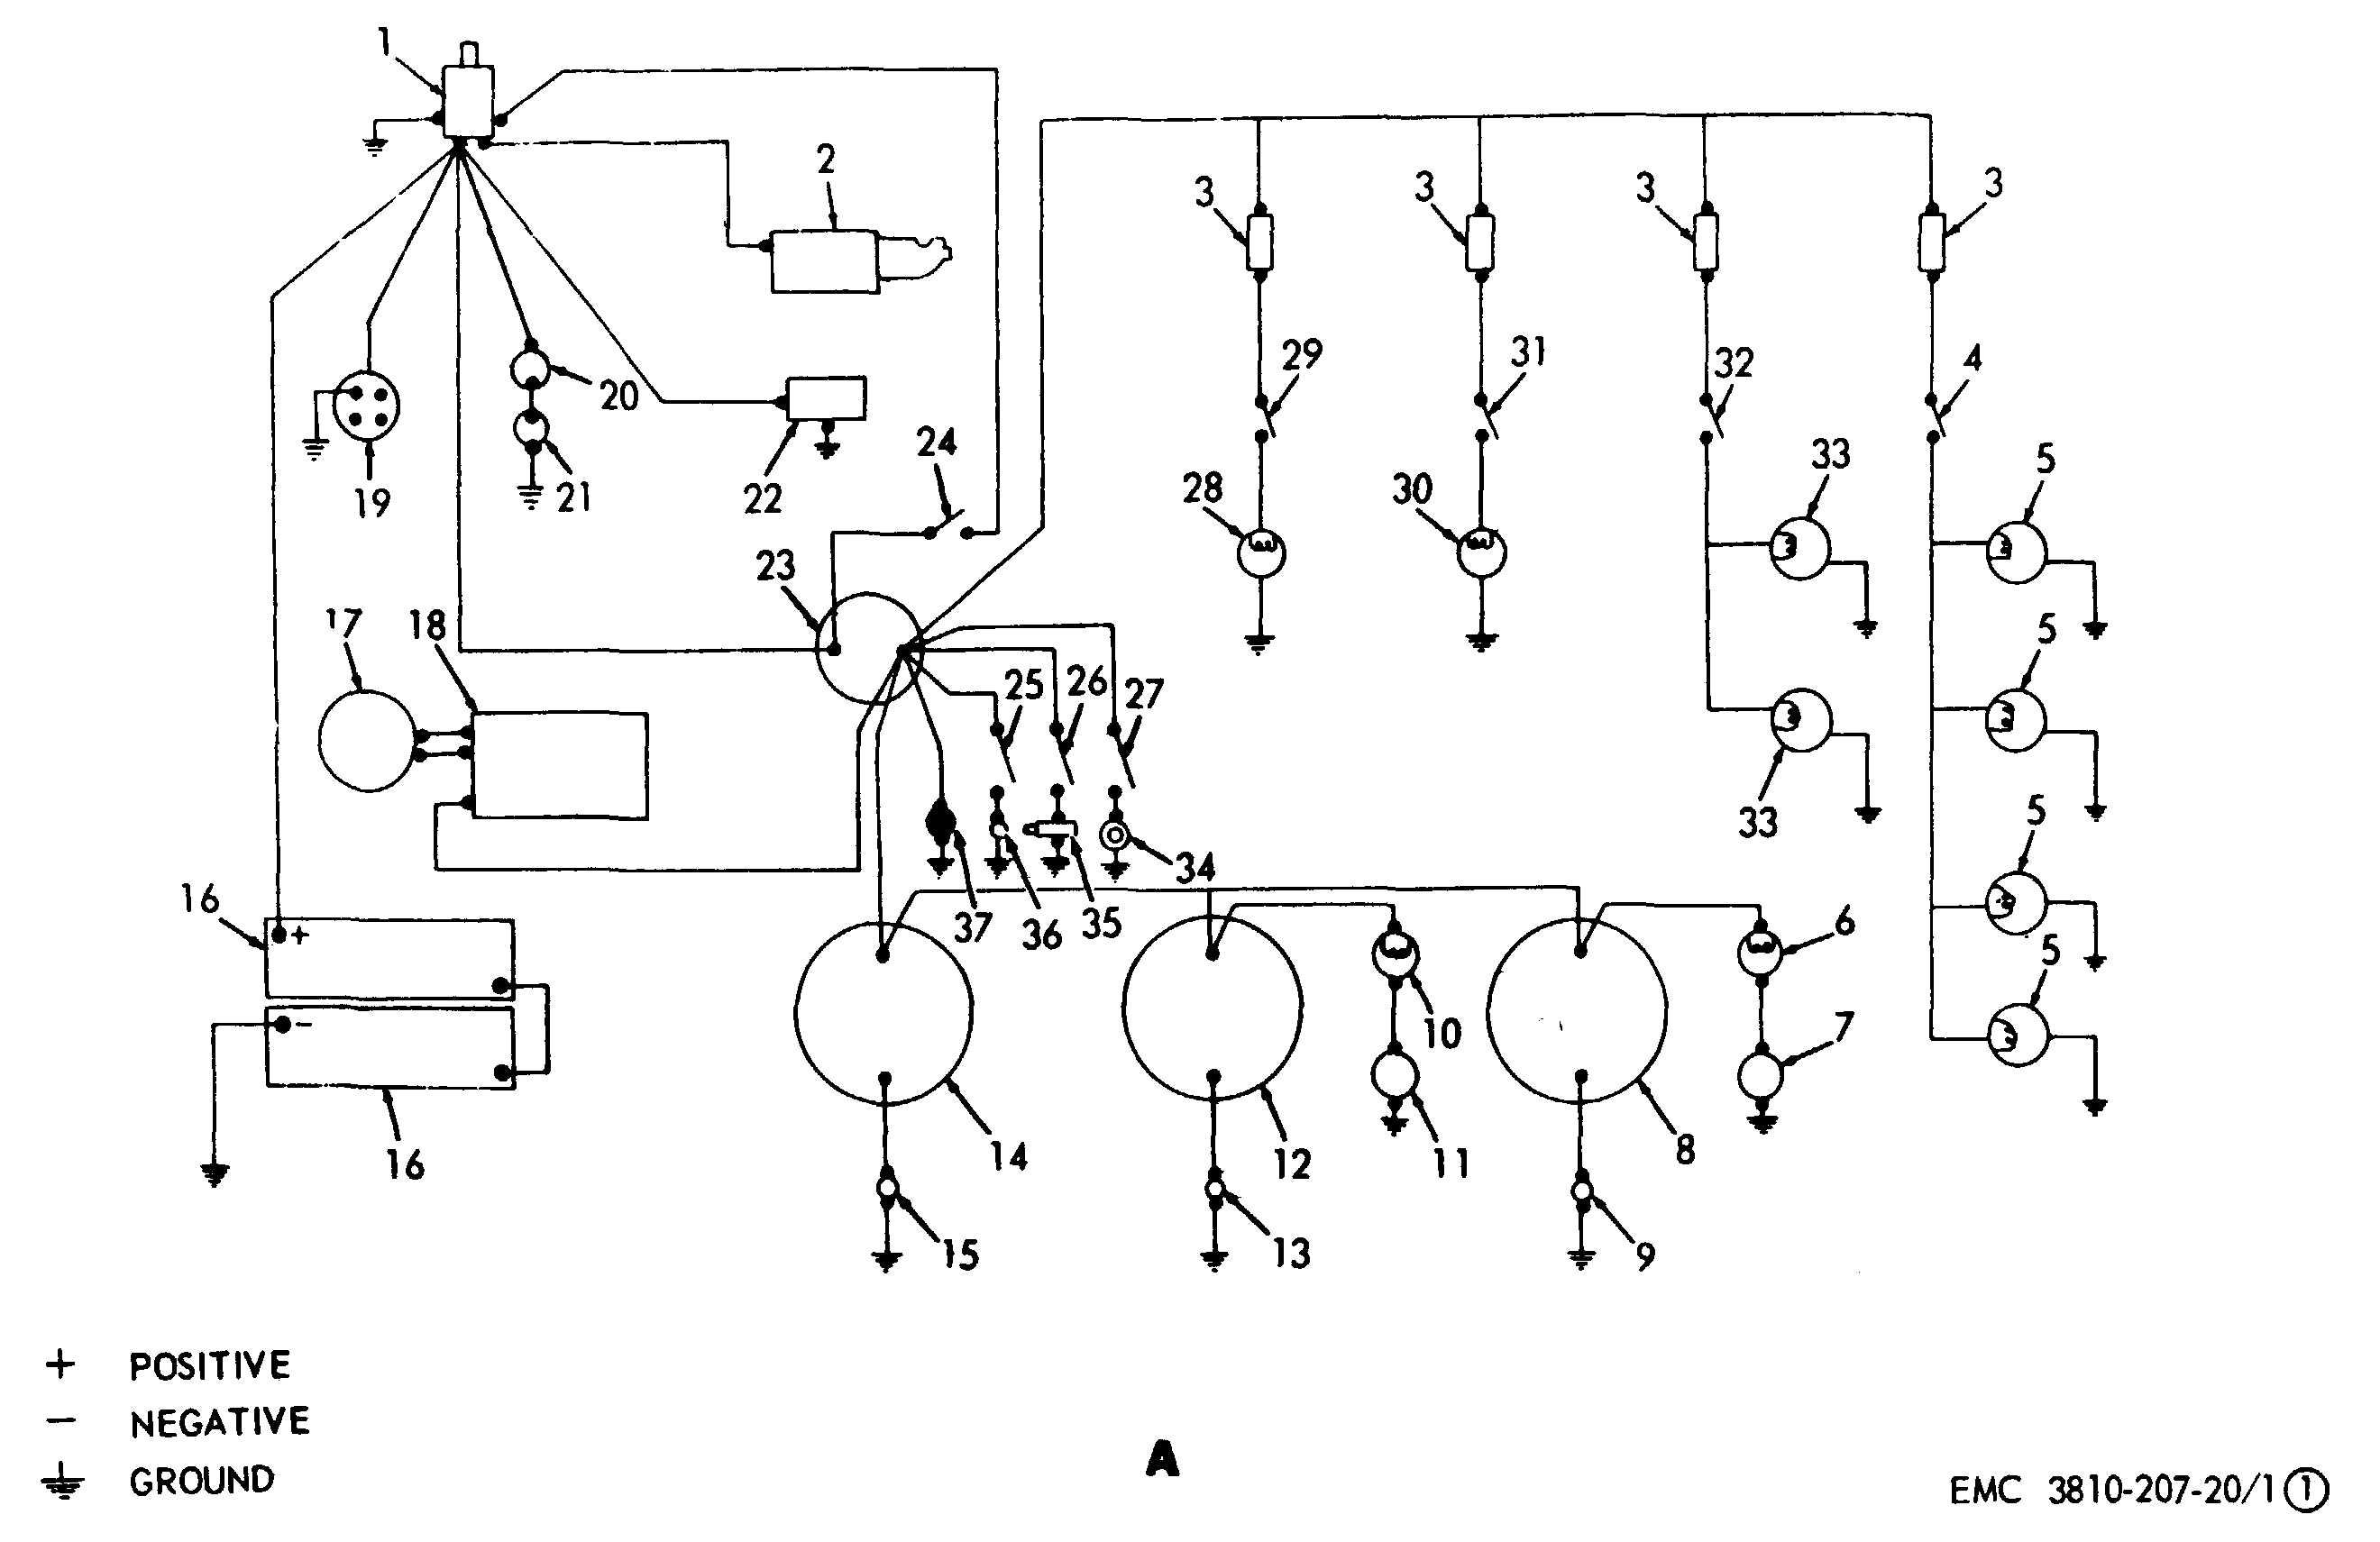 crane parts diagram 1995 acura integra alarm wiring truck mounted platform